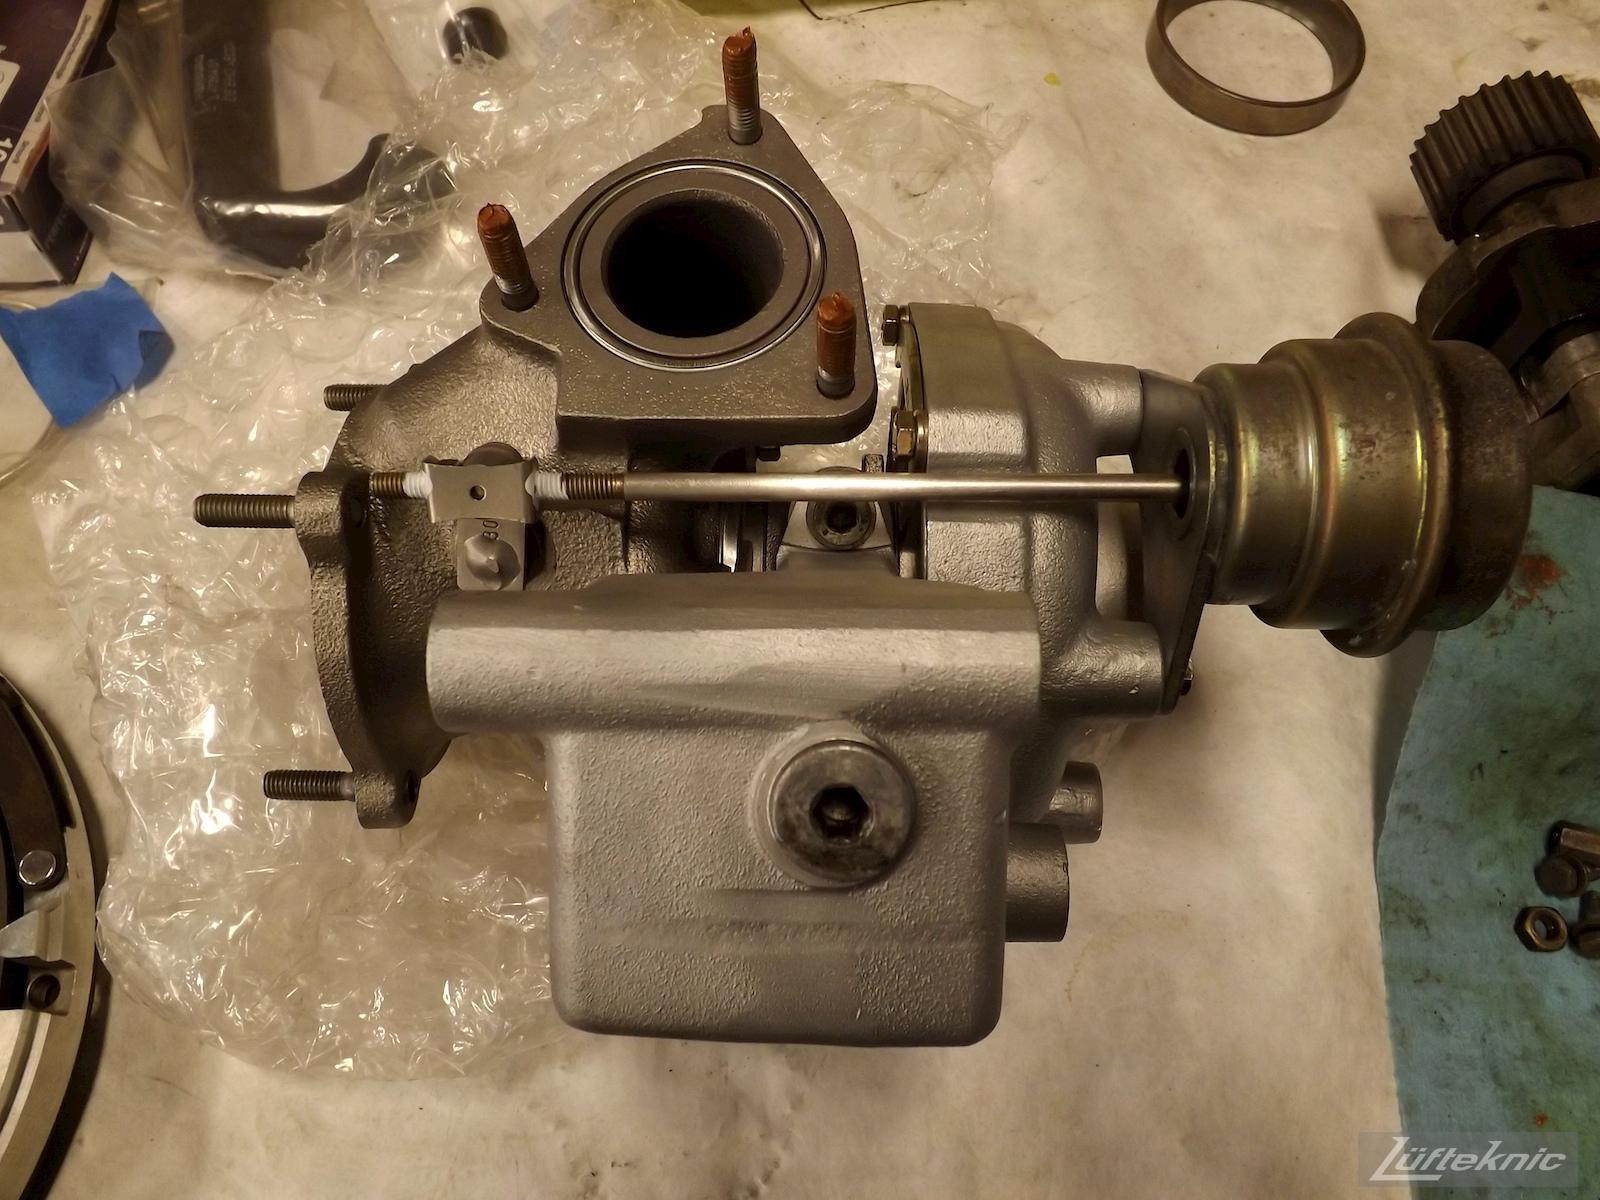 Hybrid Turbocharger for a 993 Turbo rebuild.